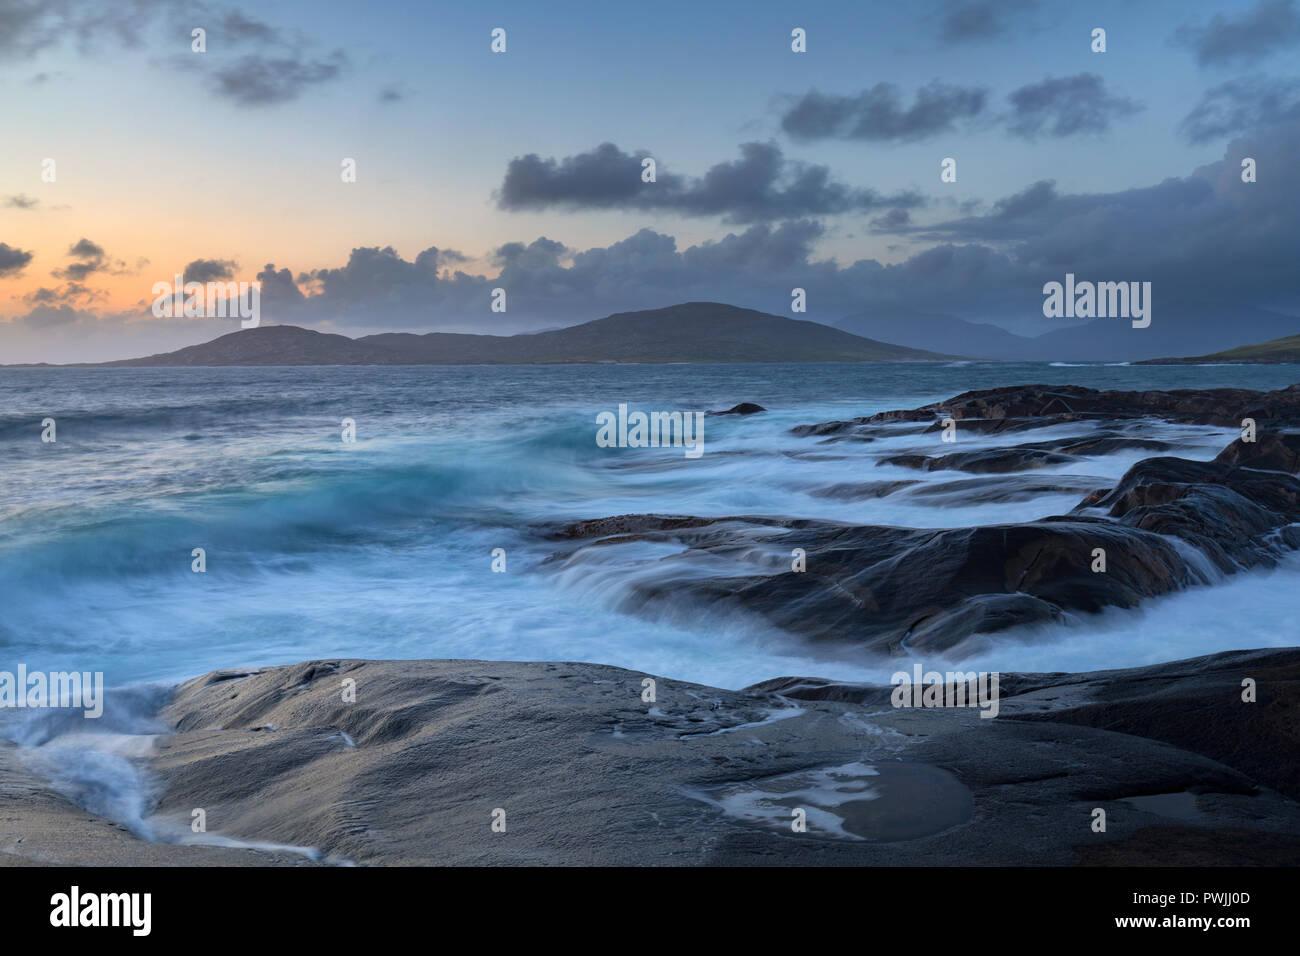 Waves crashing on the shore of Harris looking across to Isle of Taransay - Stock Image